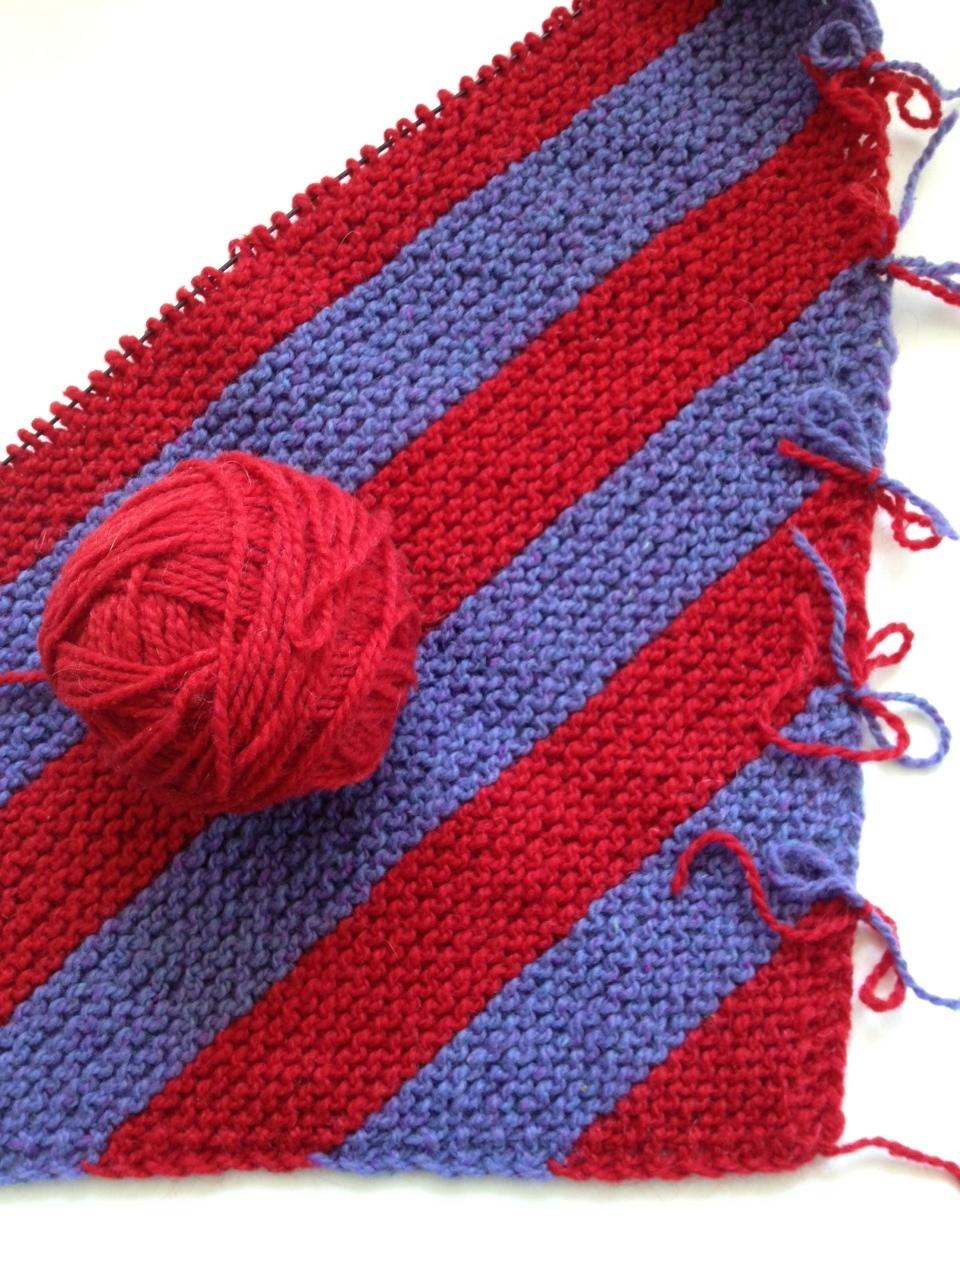 Diagonal Knitting How To Blog Nobleknits